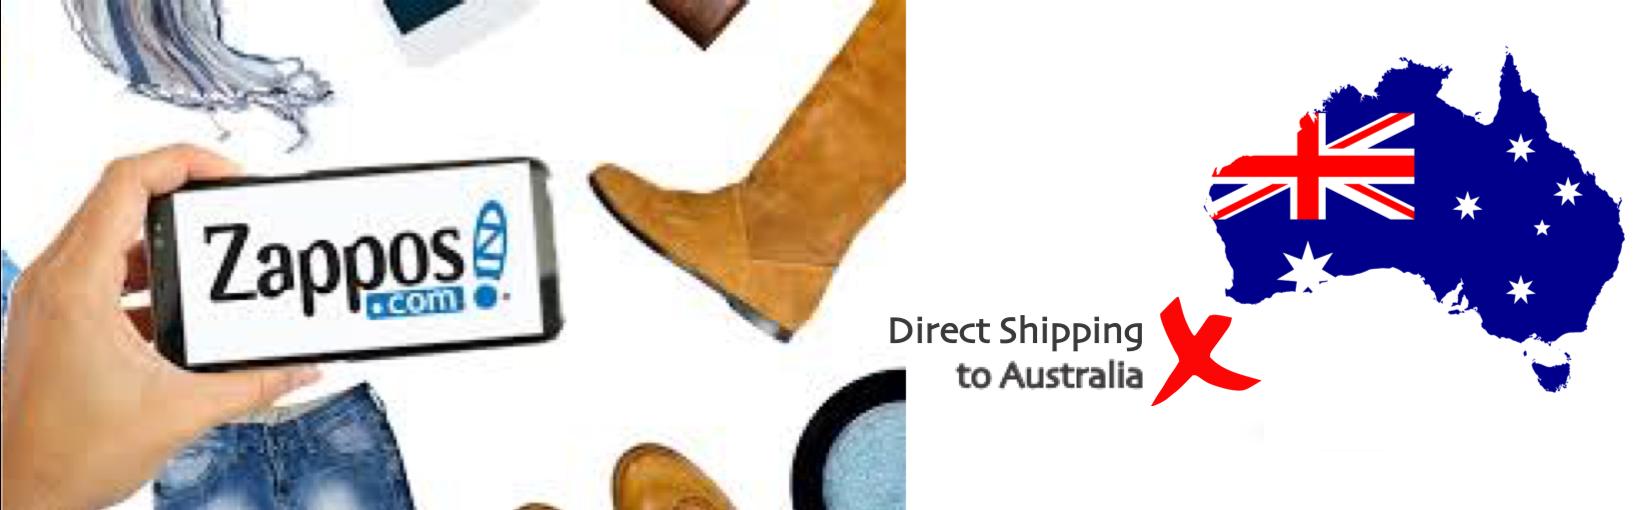 shop Zappos ship to Australia